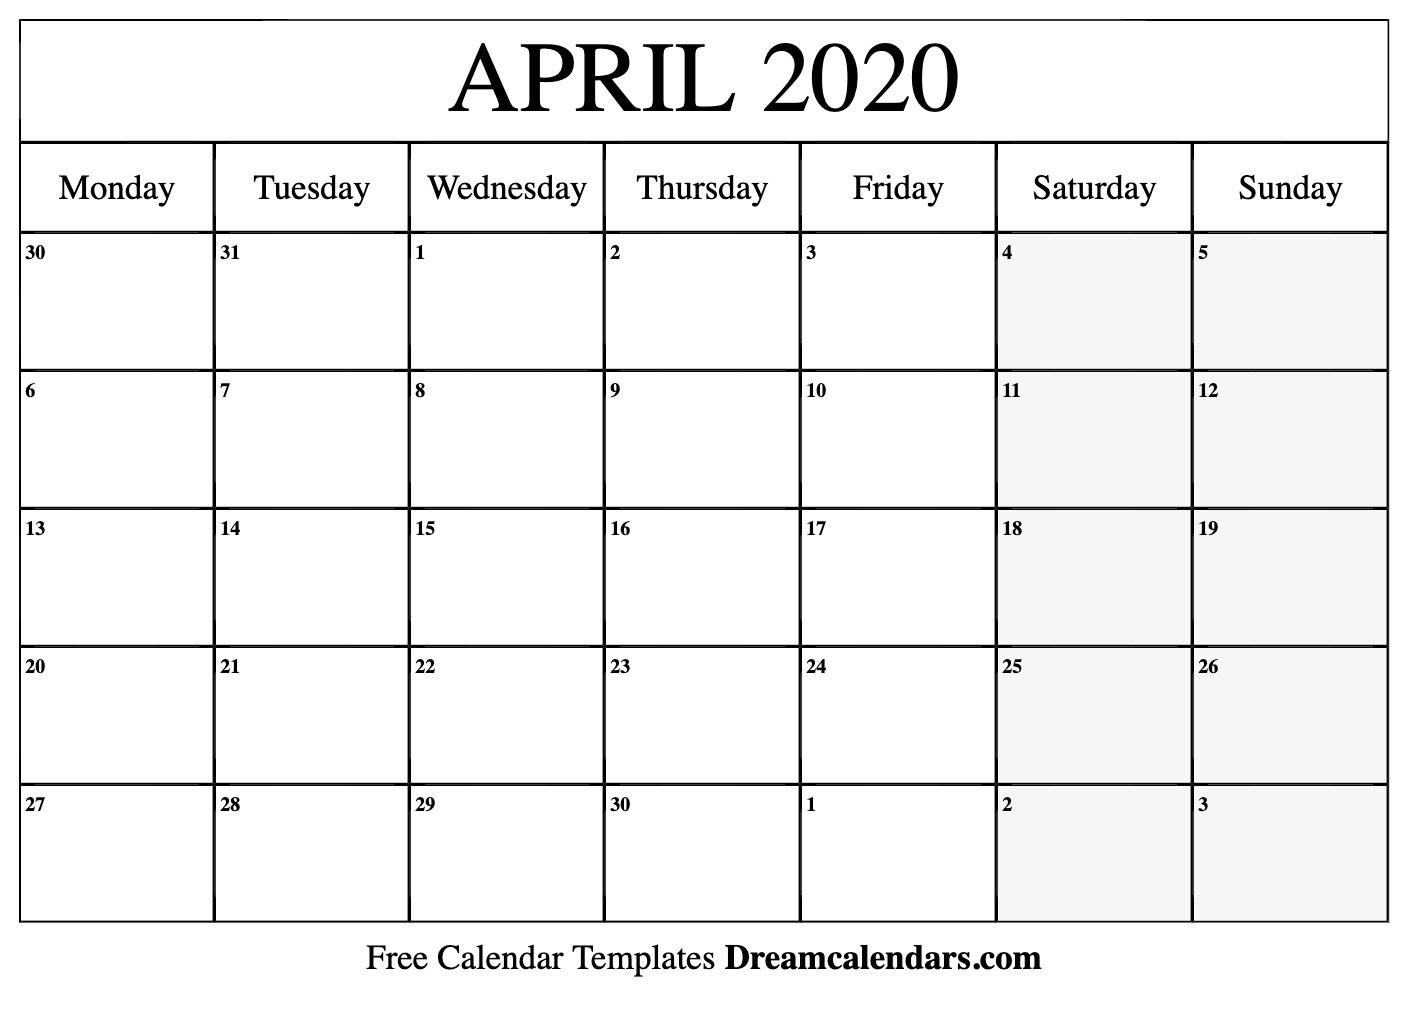 Printable April 2020 Calendar Templates - Helena Orstem - Medium  2020 Calendar Template